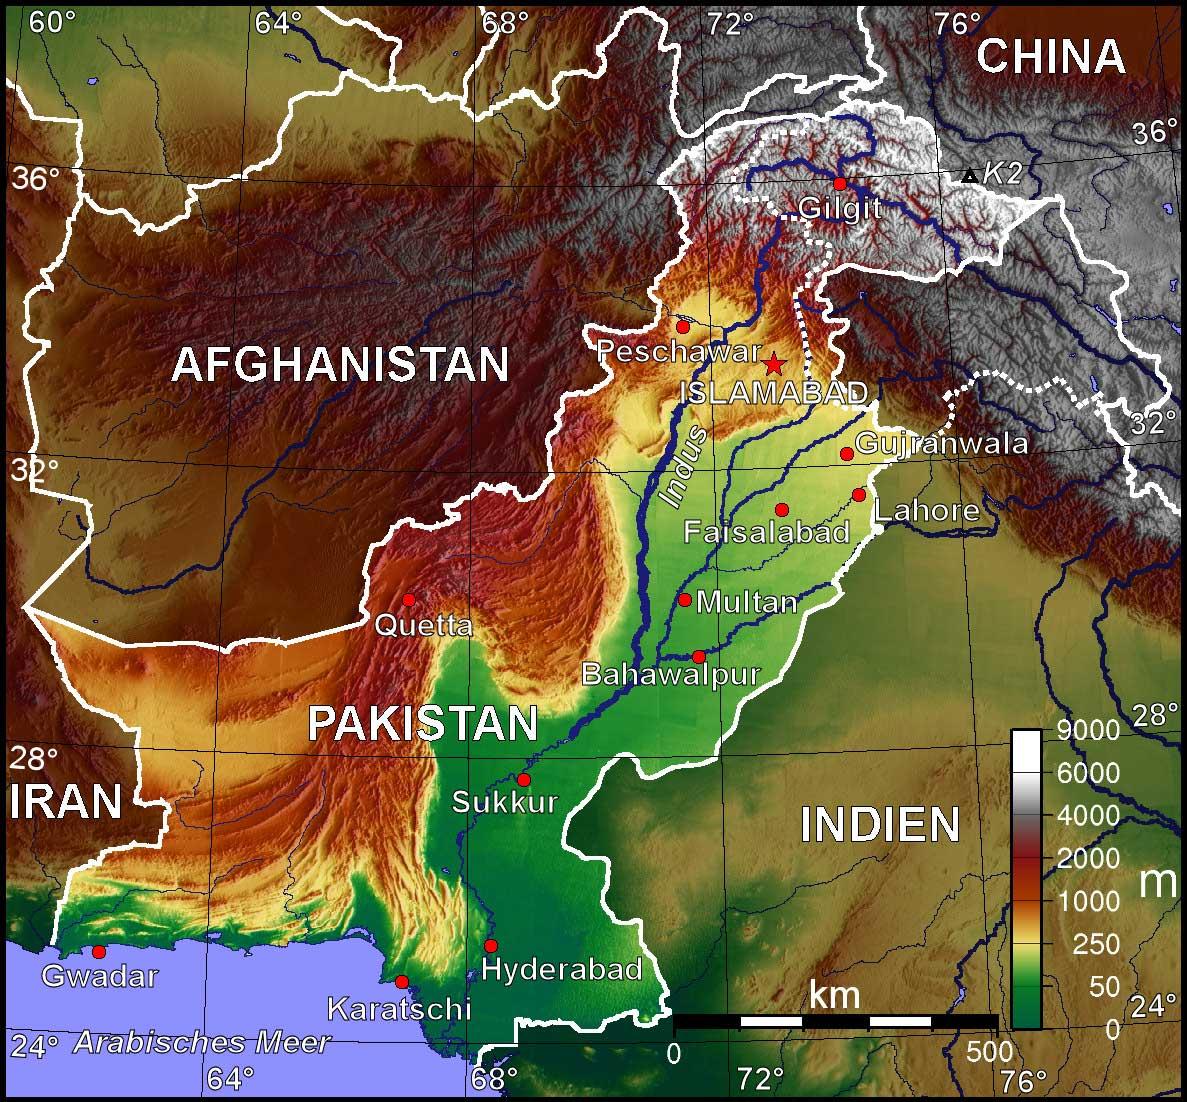 Pakistan Map - Silk Road - Study Abroad Journal - Steven Martin - Indus River Valley Civilization